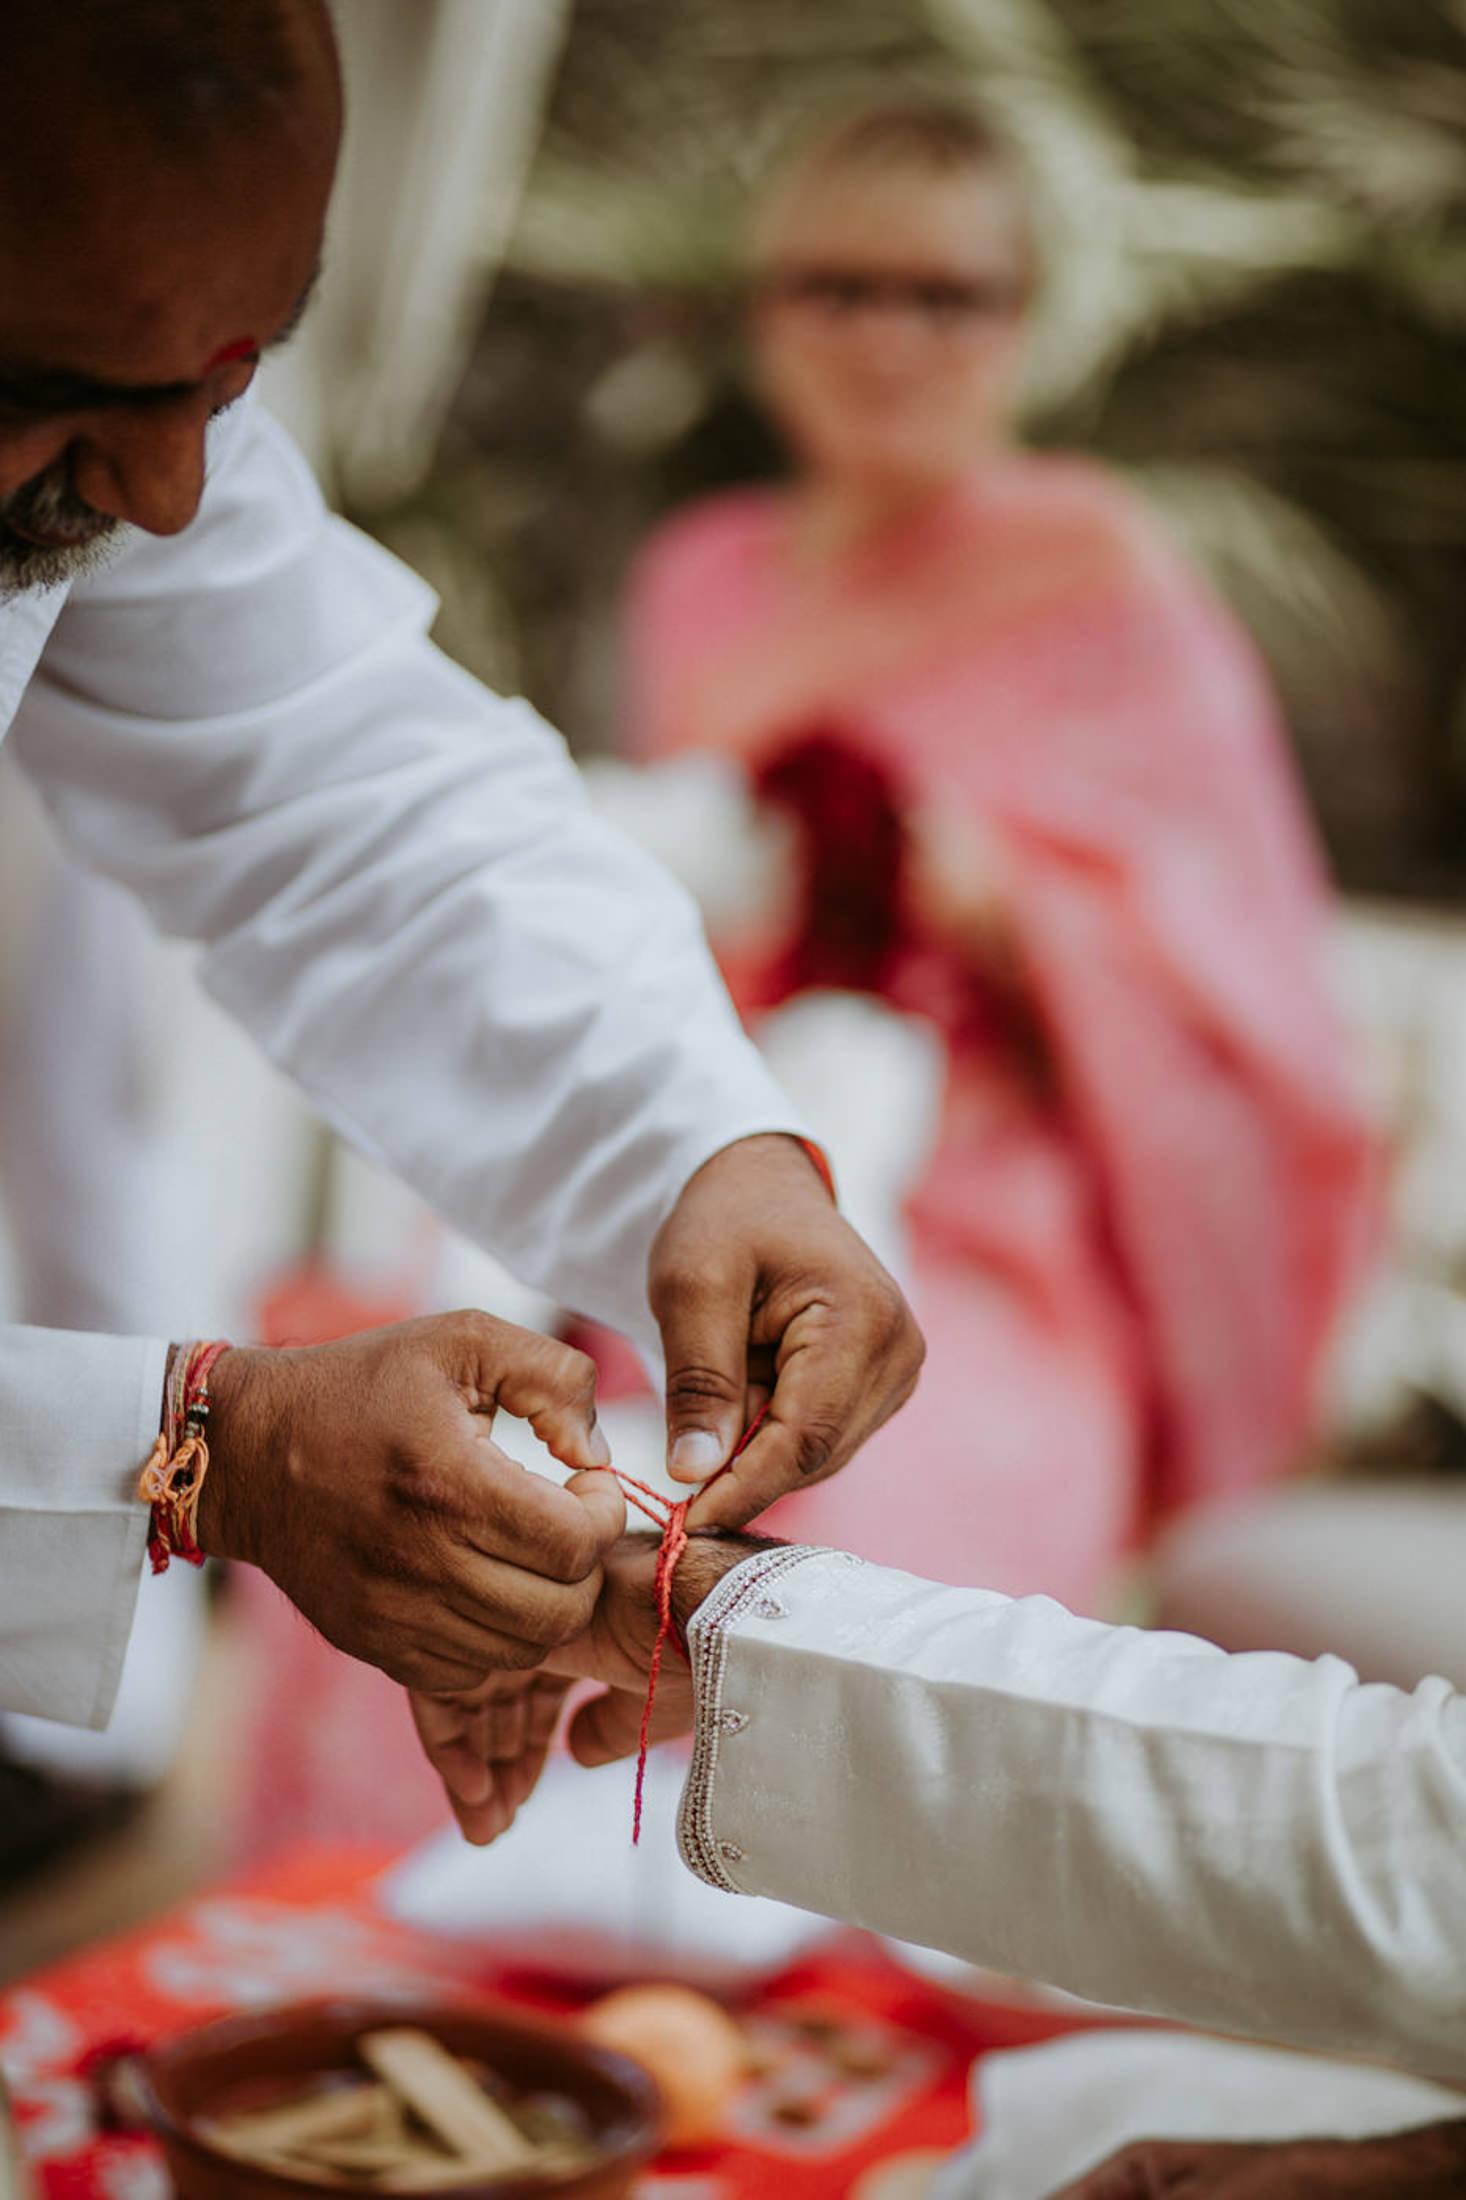 Wedding_Photographer_Mallorca_Daniela-Marquardt_Photography_New_York_Iceland_Tuscany_Santorini_Portugal_Austria_Bavaria_Elopement_Hochzeitsfotograf_AntjeRajat2_43